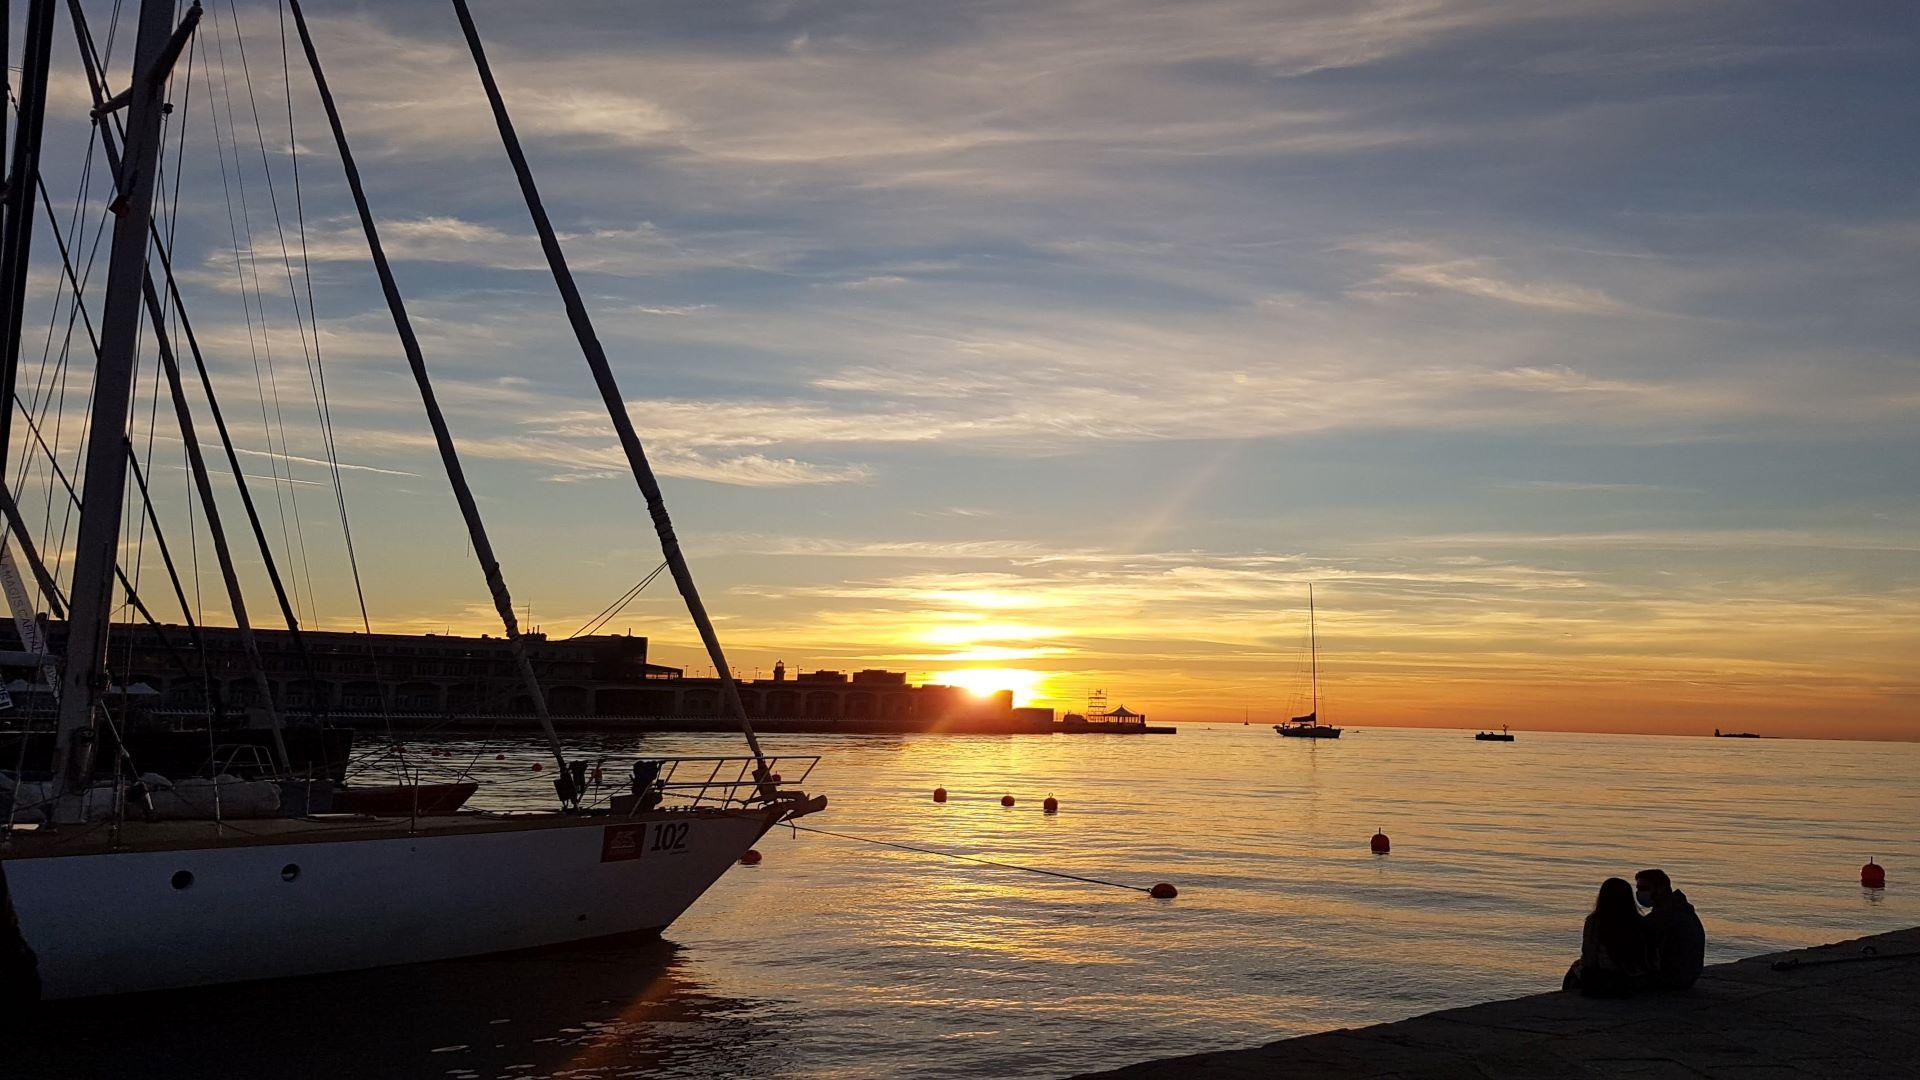 TTrieste tramonto romantico min